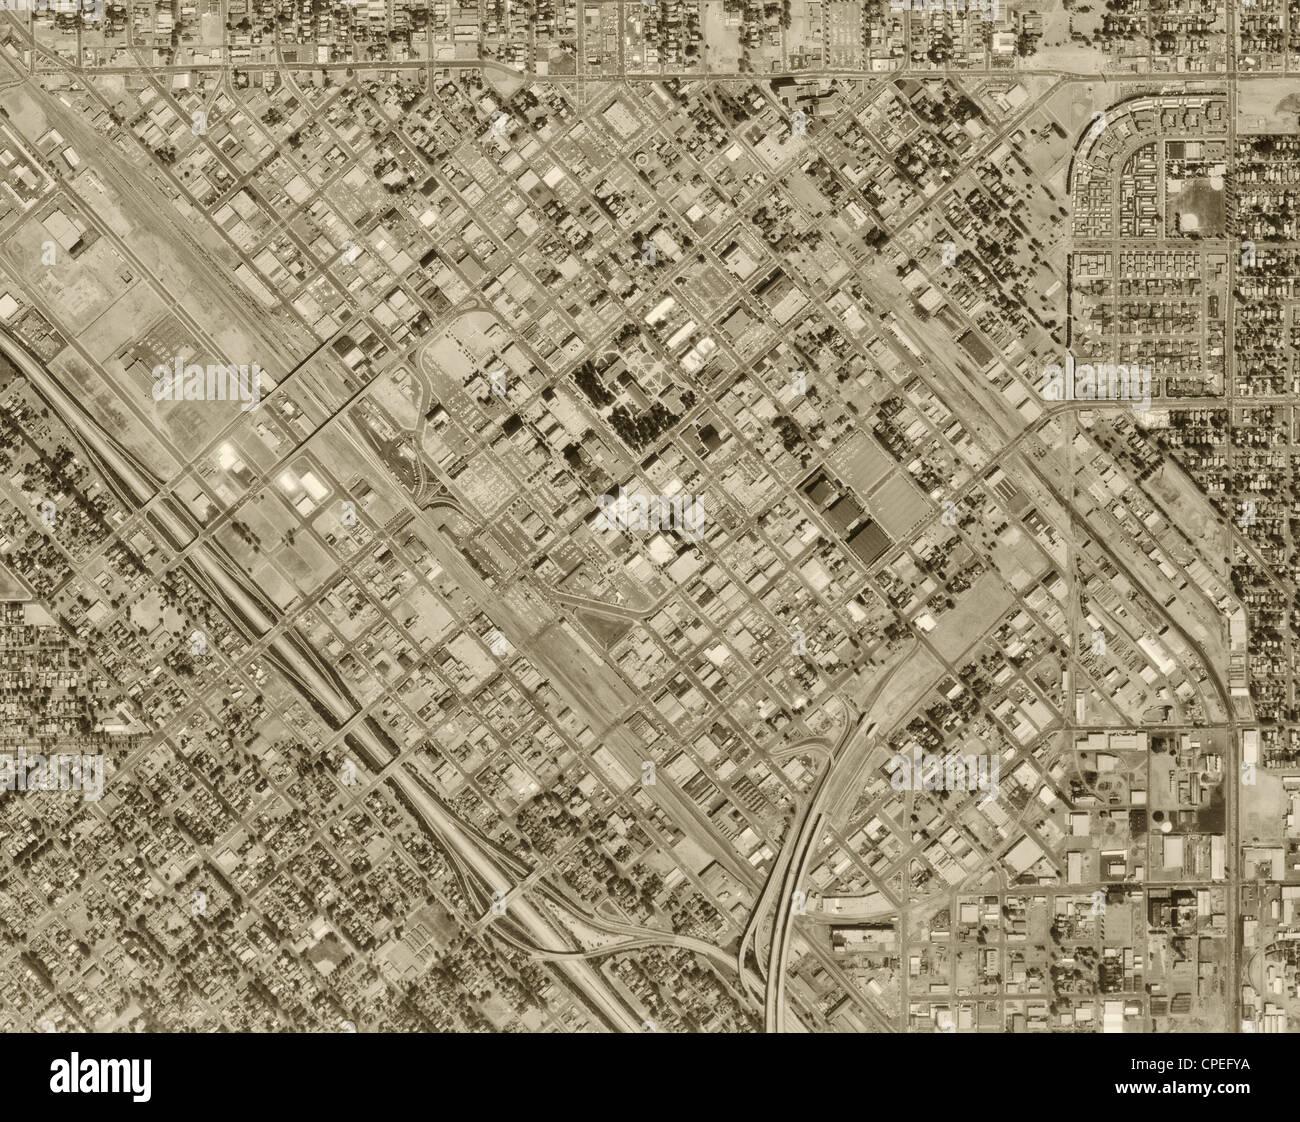 historische Luftaufnahme Fresno, 1972 Stockbild